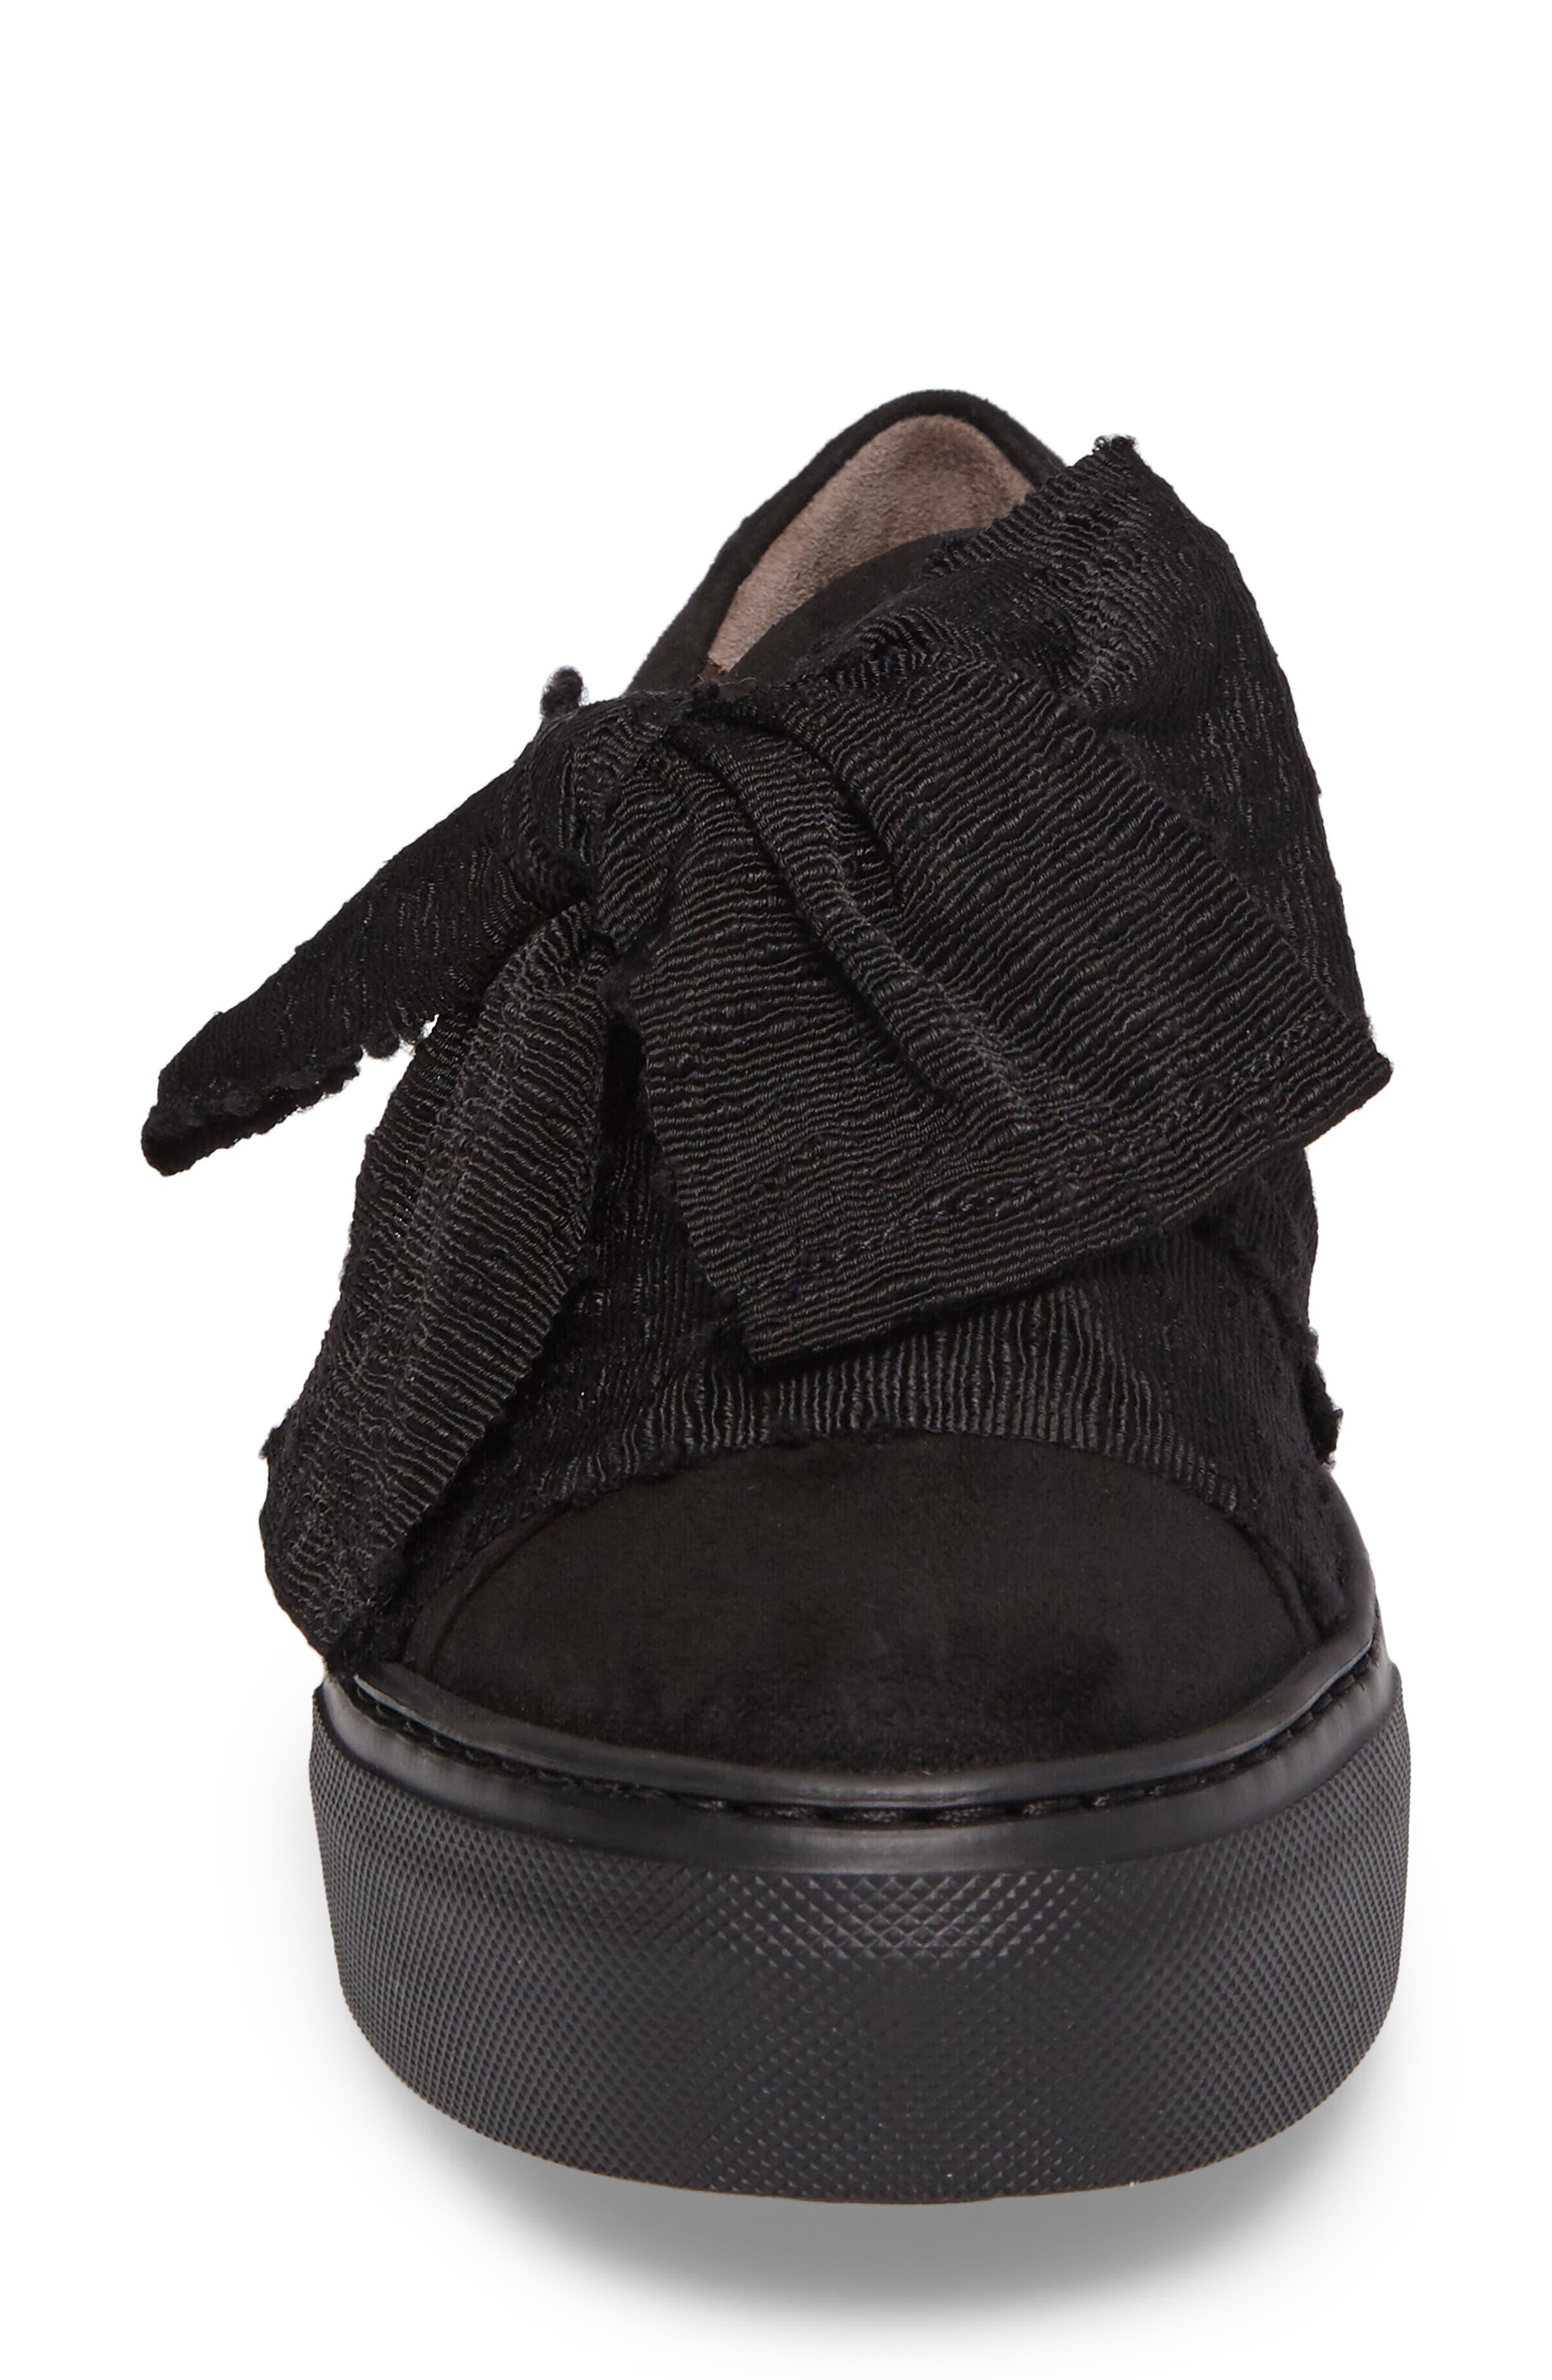 Bow Platform Sneaker,                             Alternate thumbnail 4, color,                             002